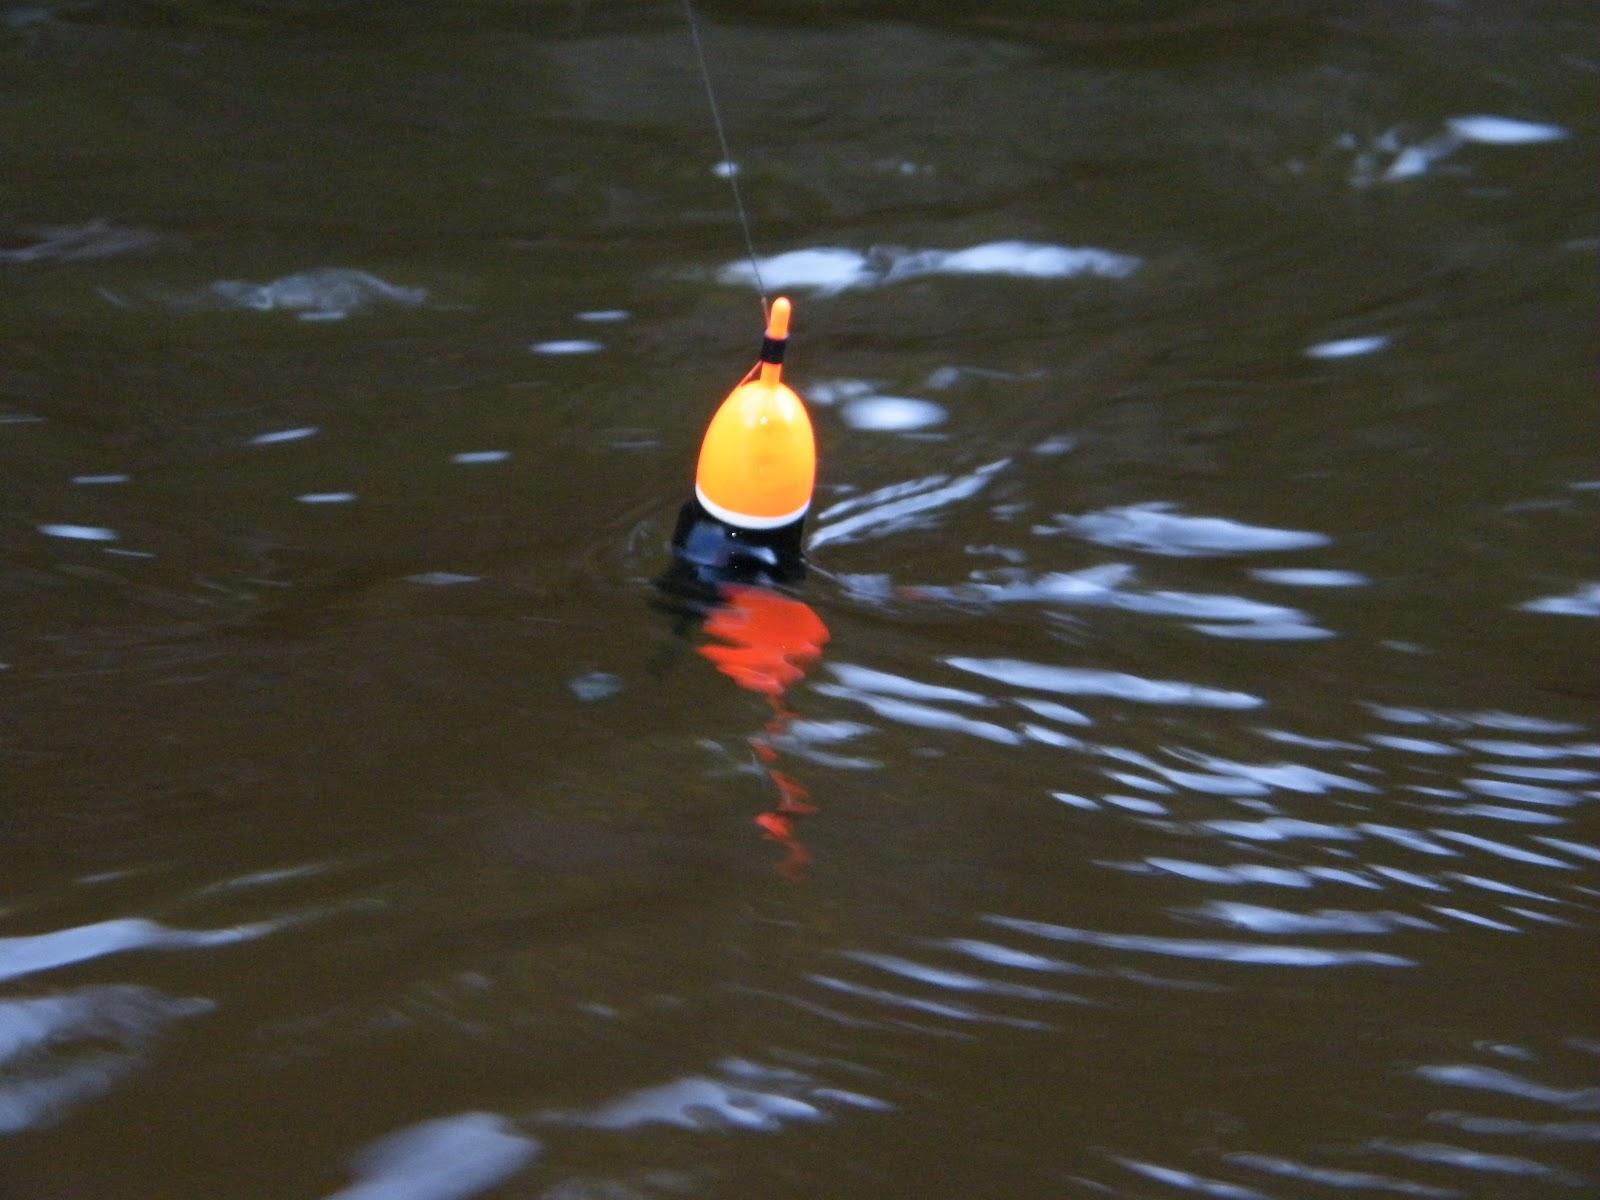 Slab seeker fishing float fishing for steelhead for Fishing for floaters